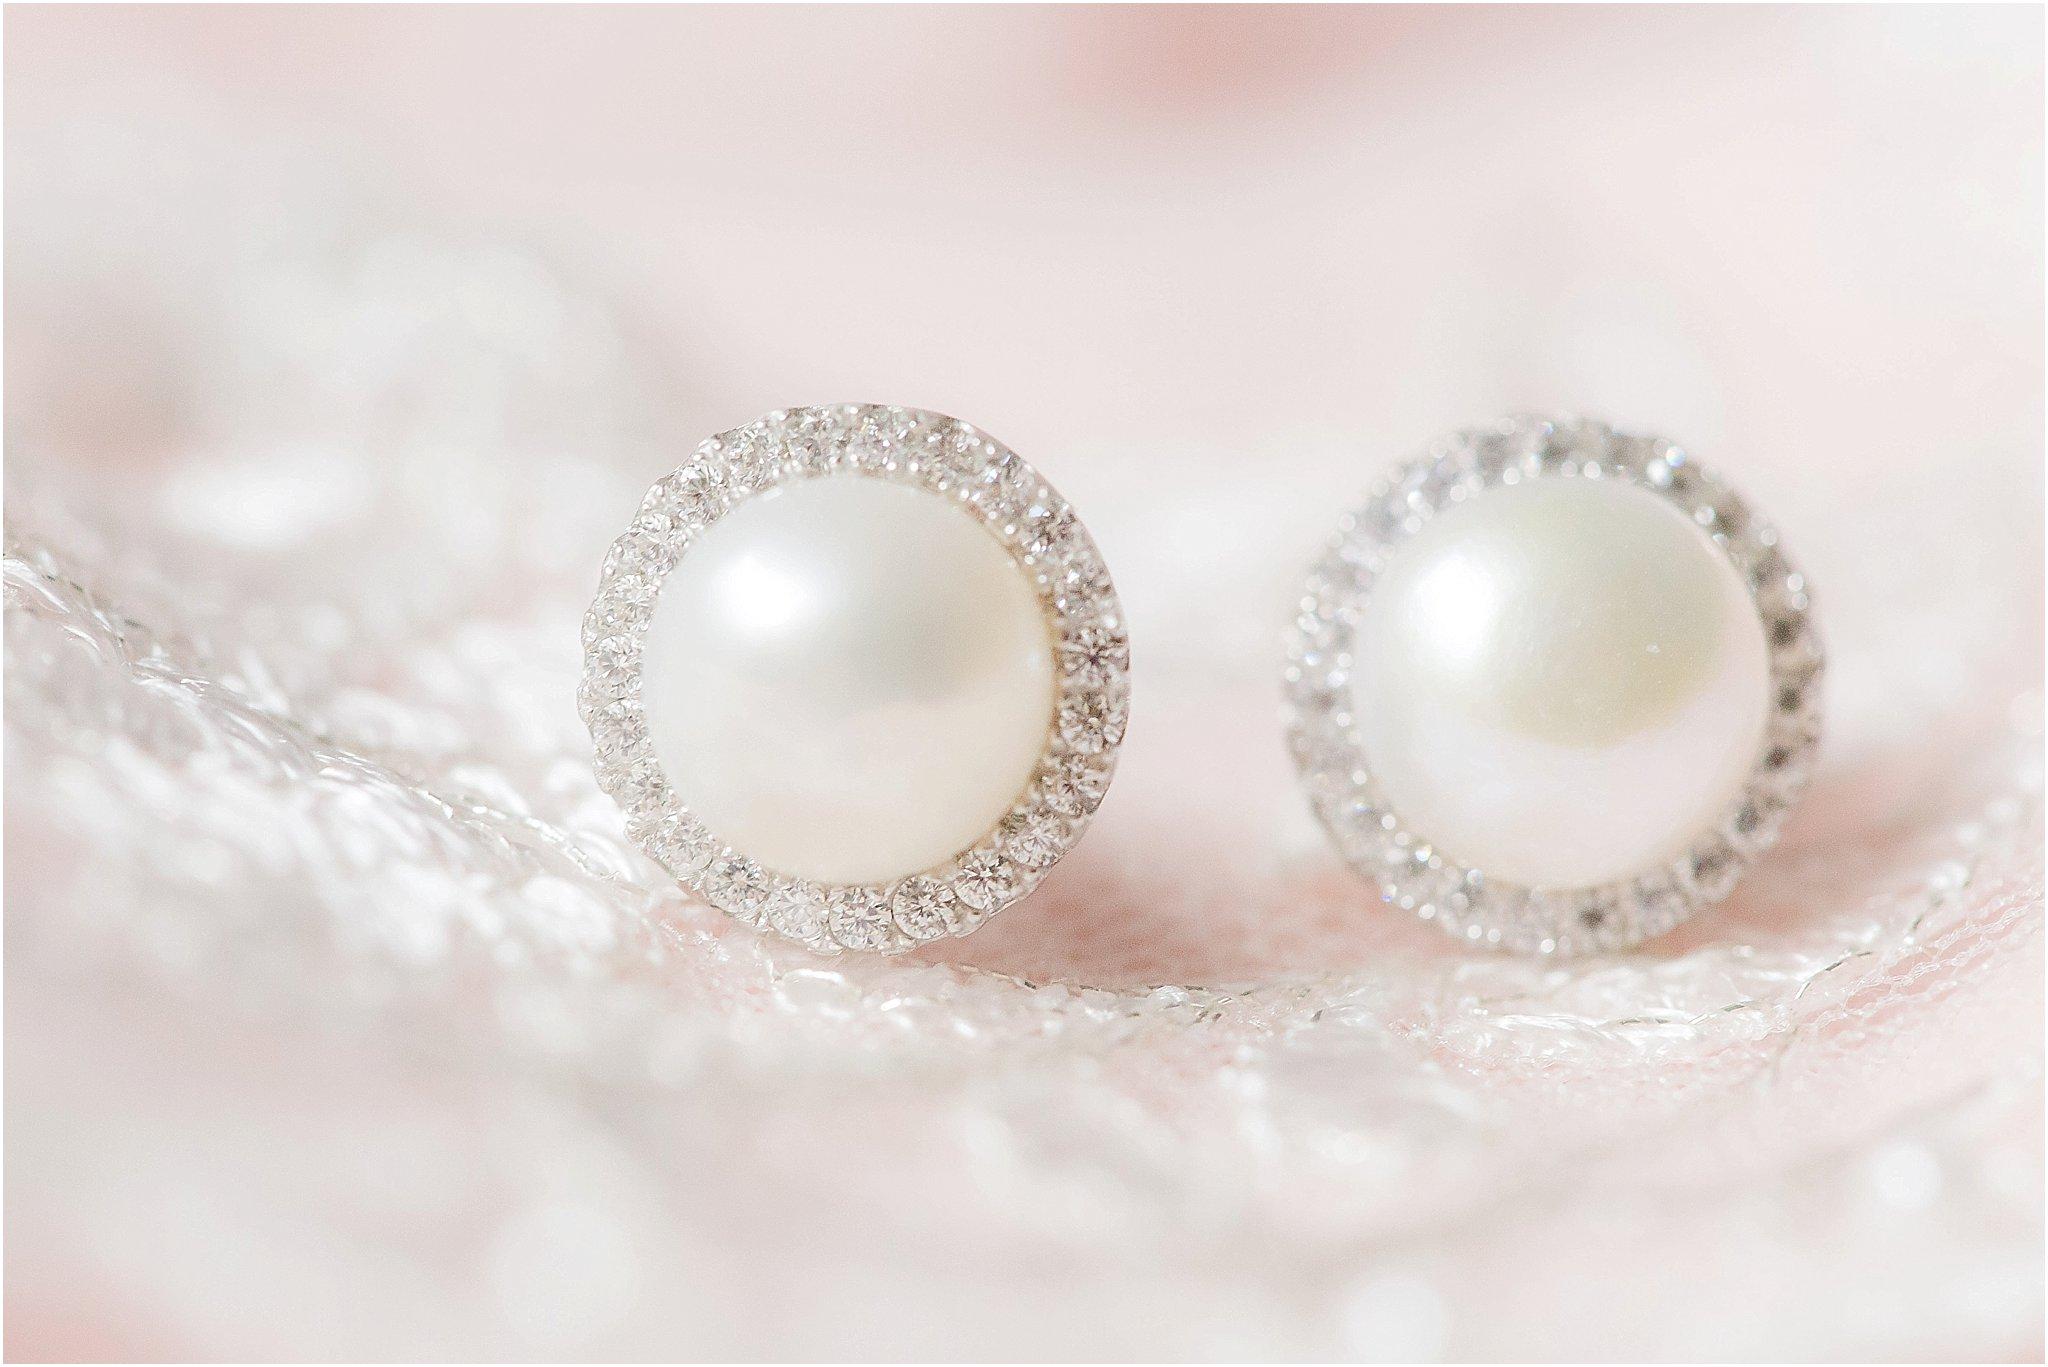 Blush rustic wedding pearl earrings on lace